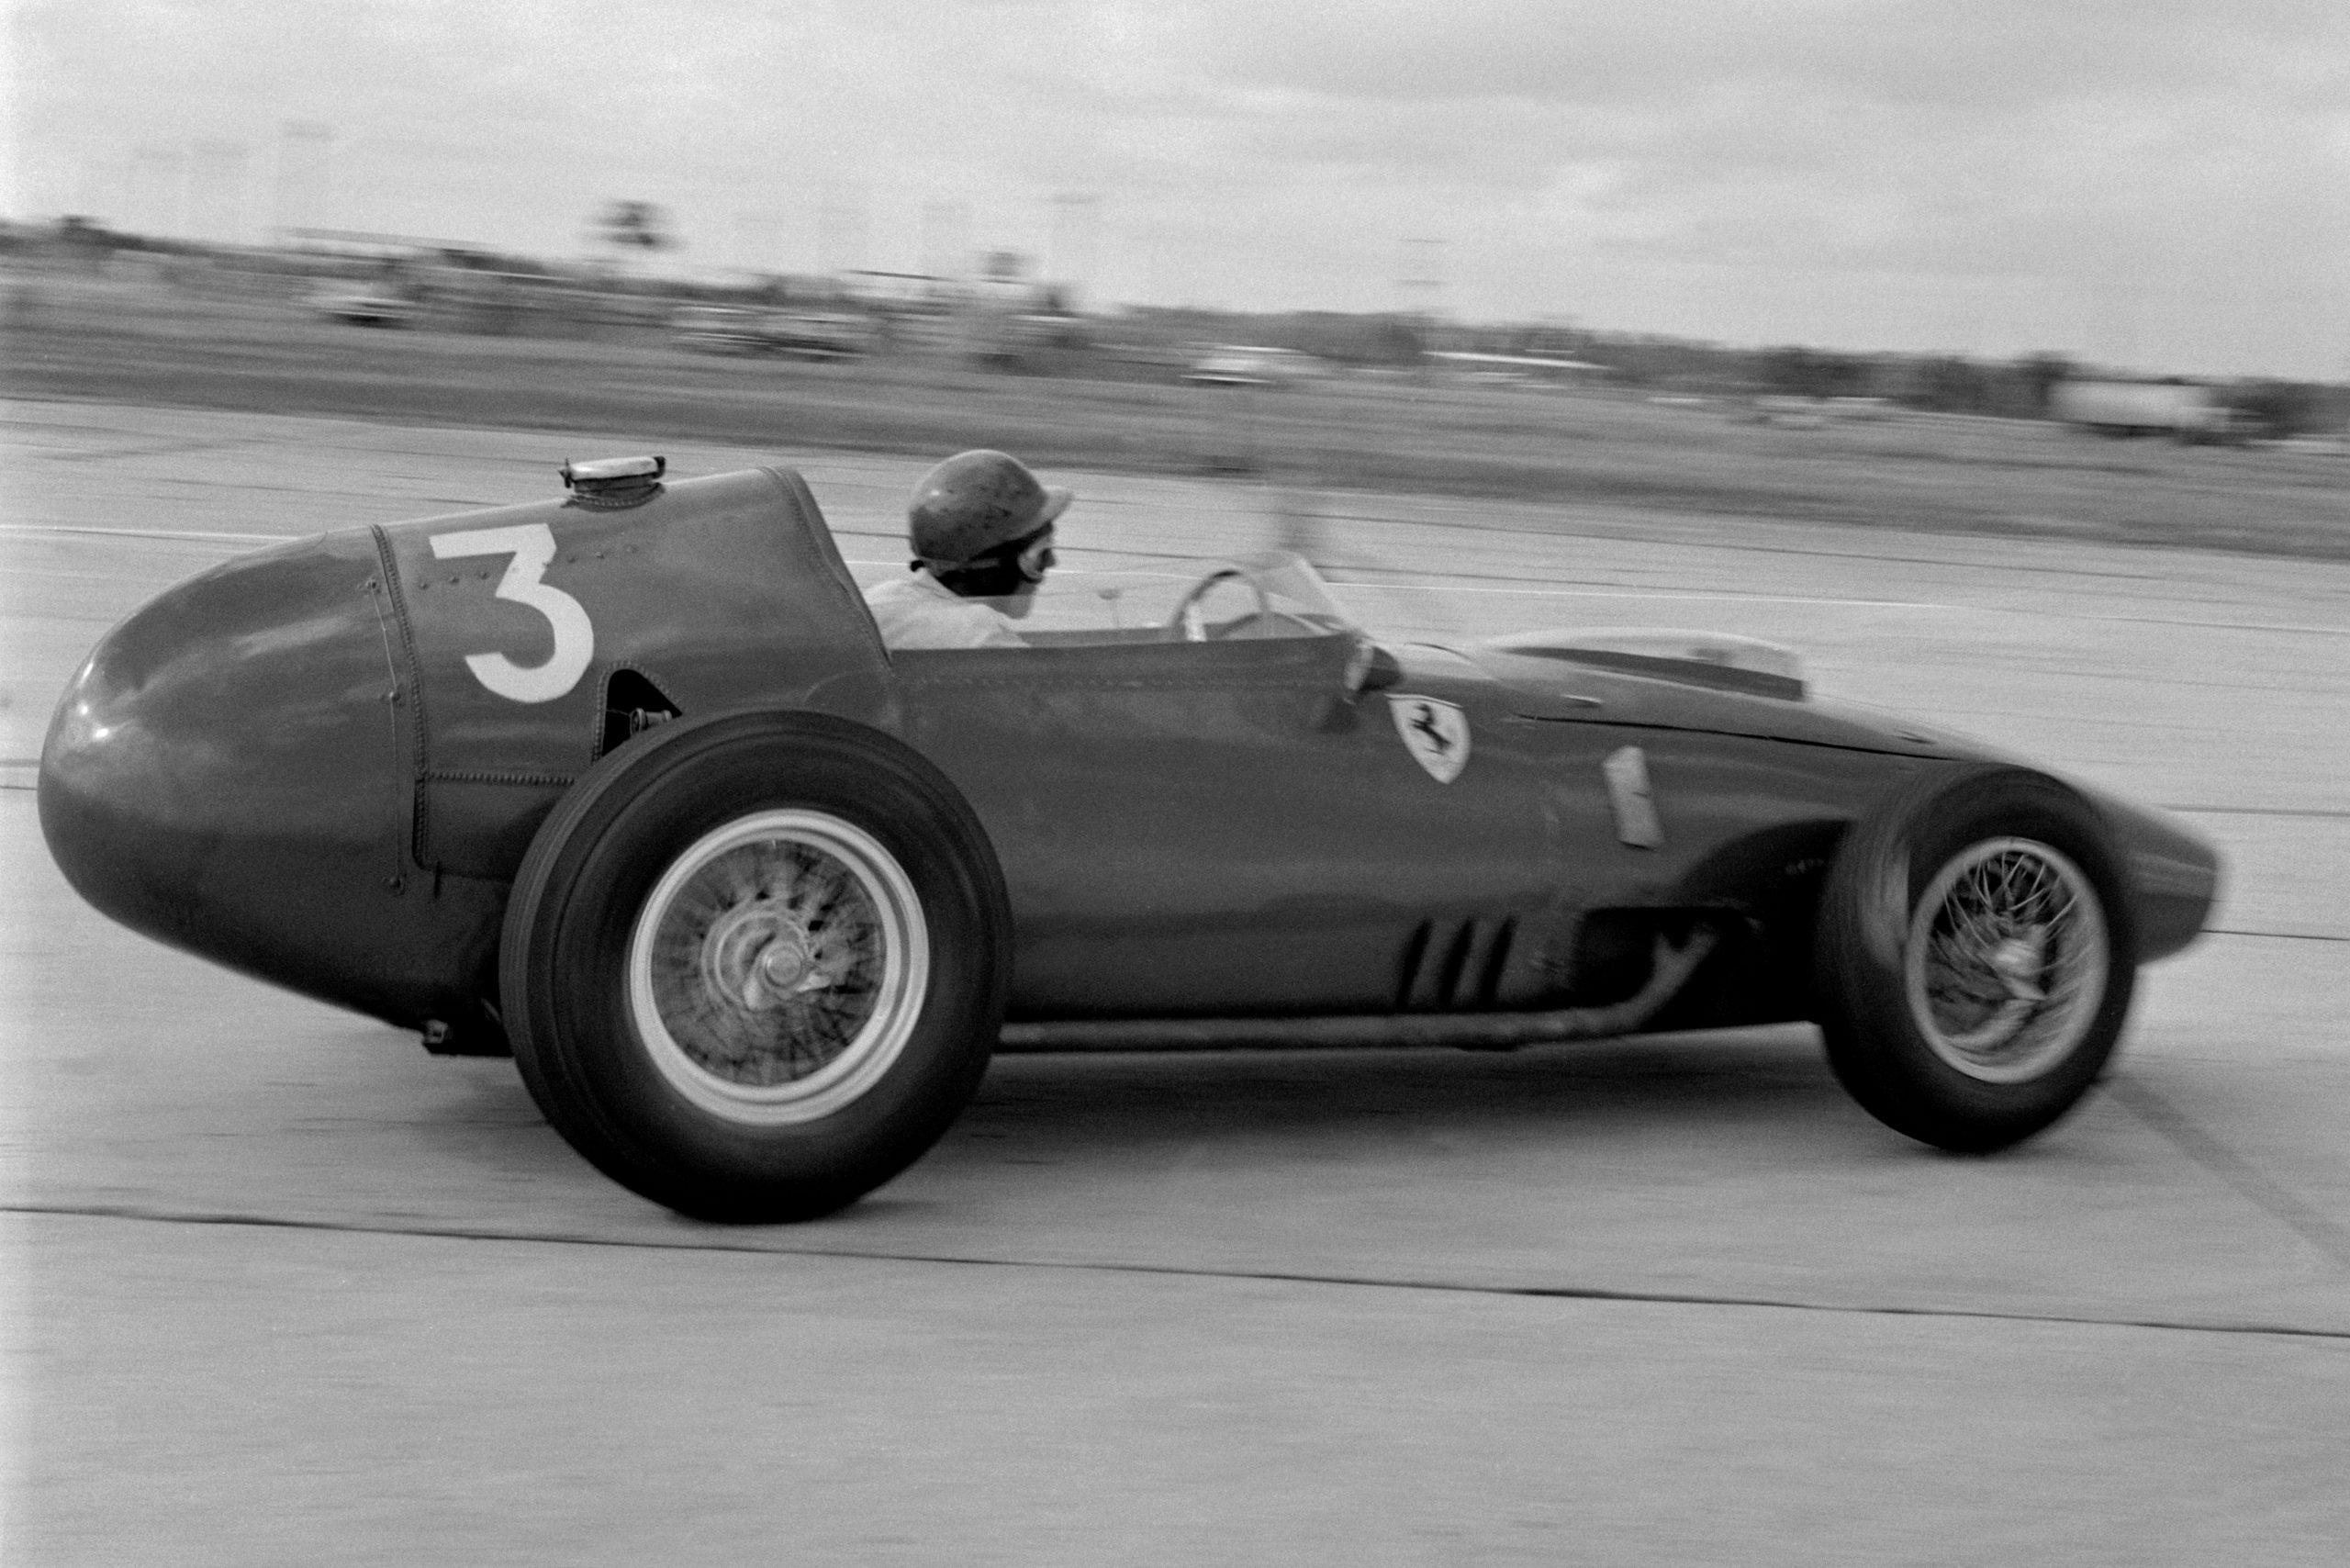 Cliff Allison in his Ferrari Dino 246, who later retired.